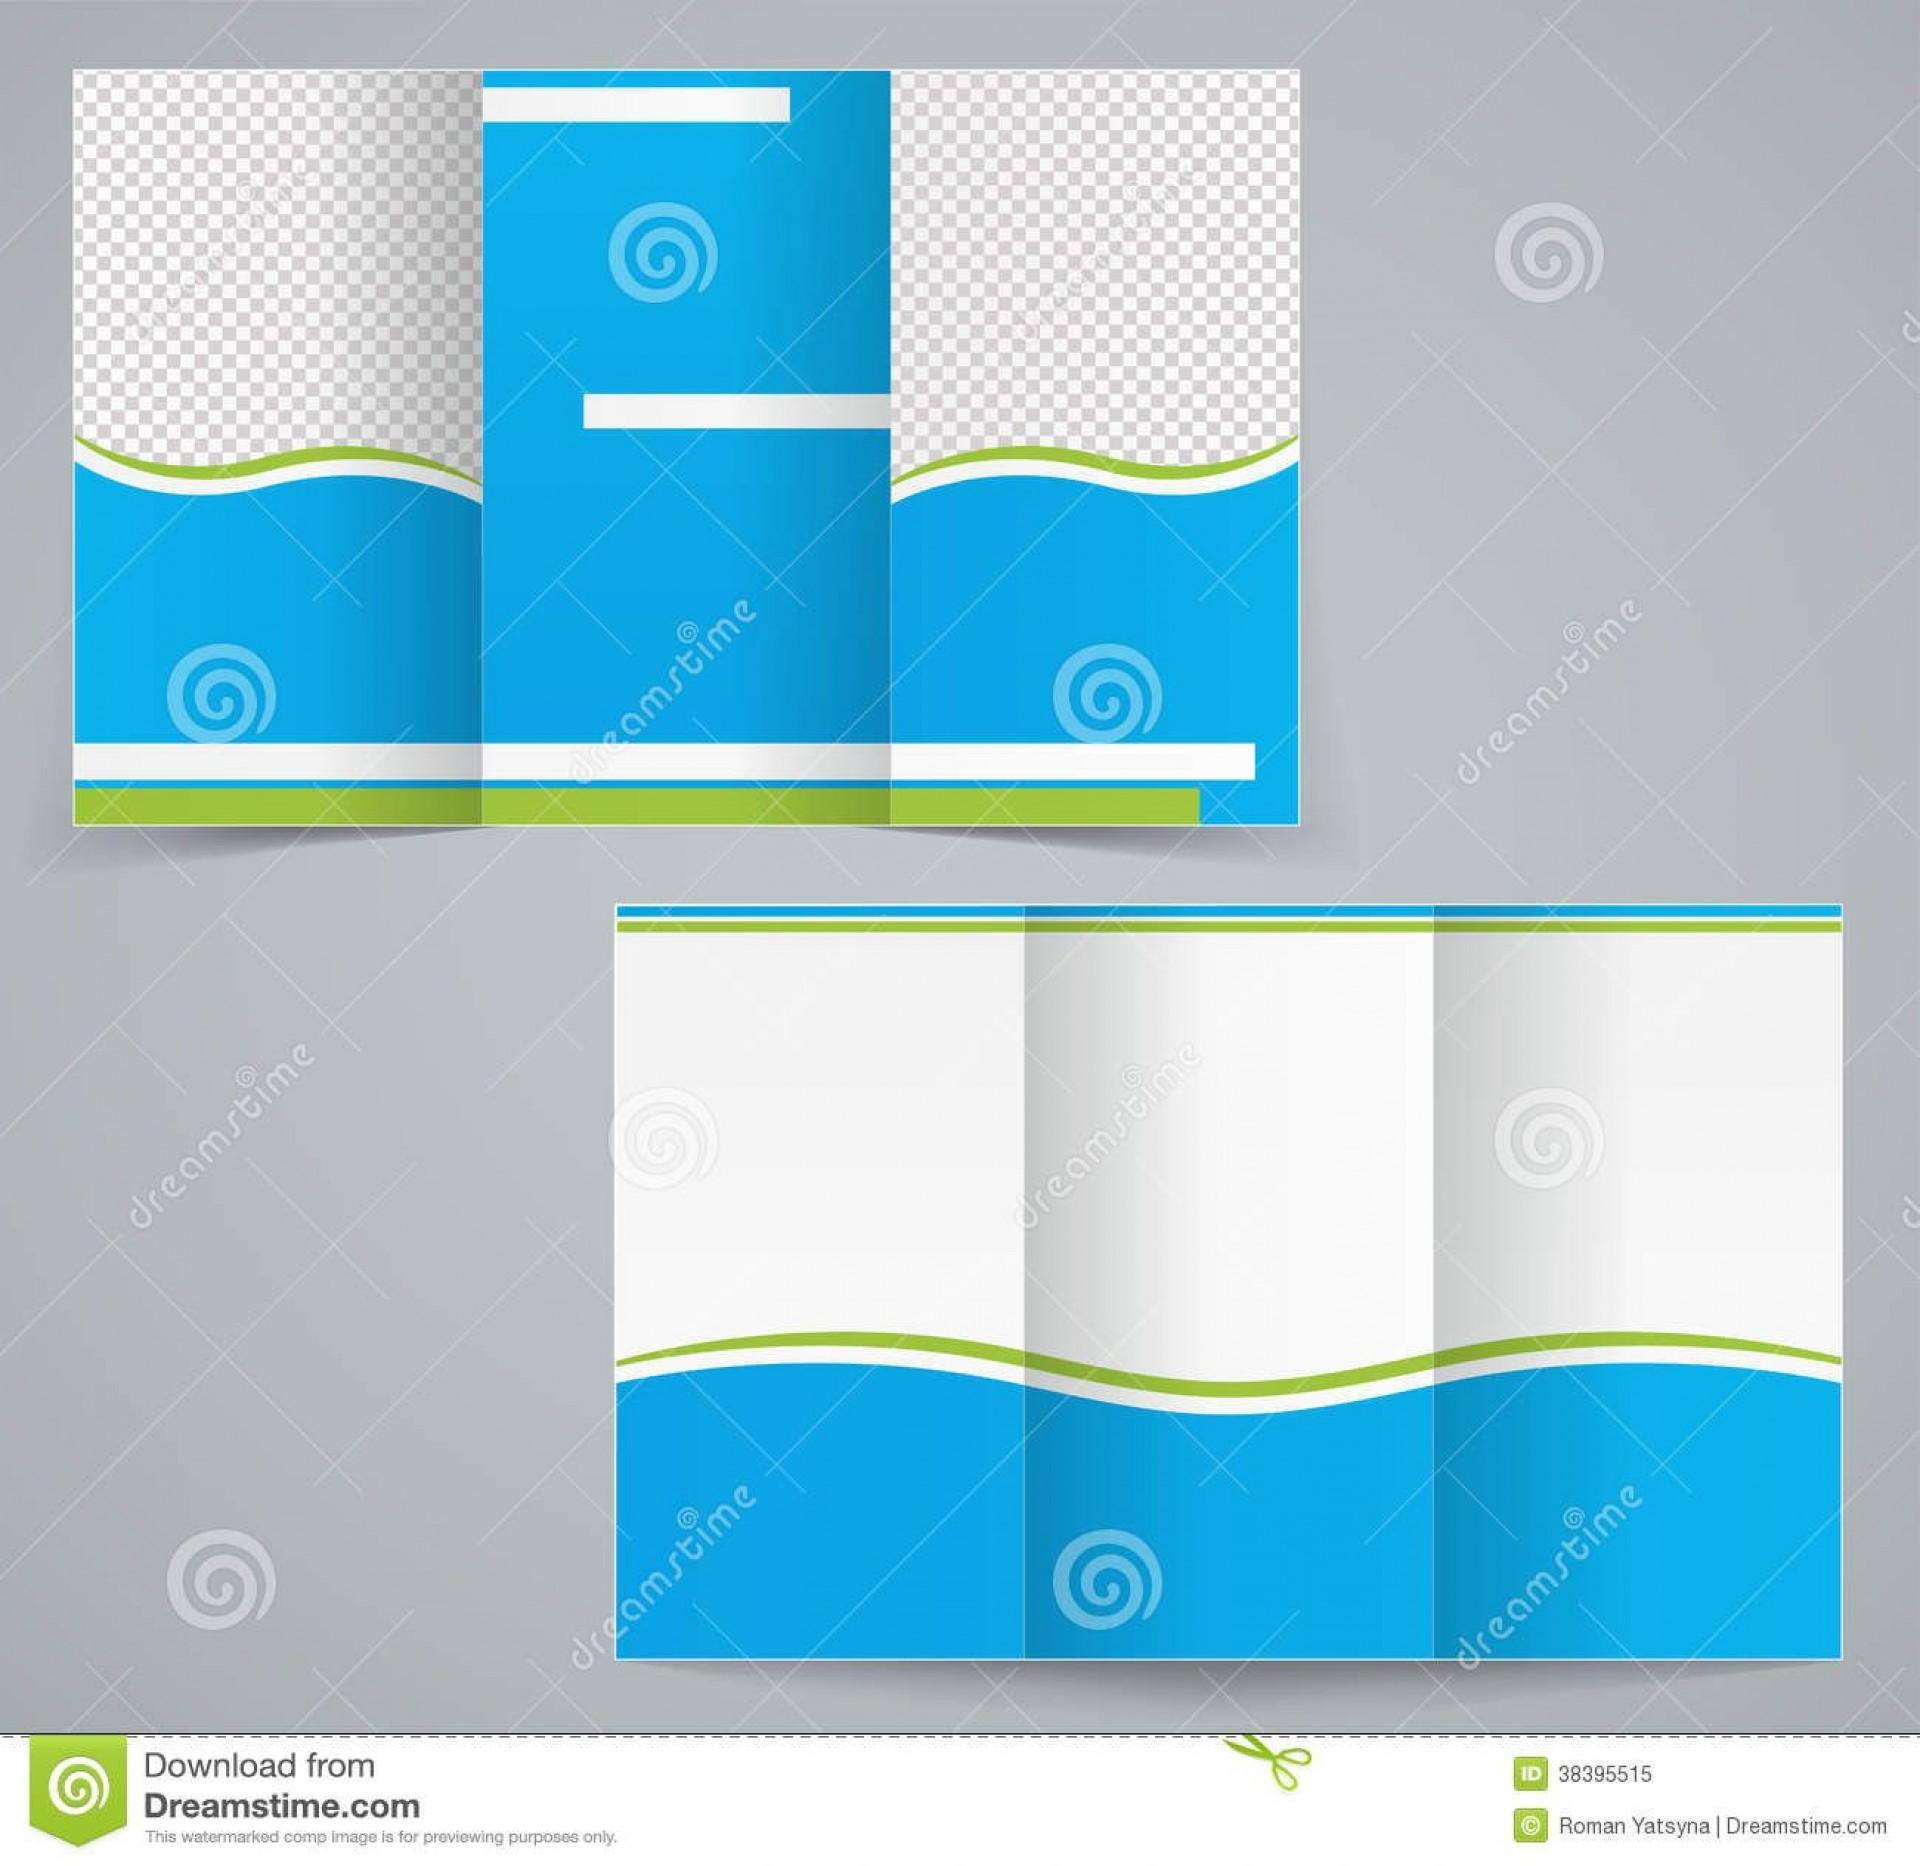 008 Top Tri Fold Brochure Template Word Idea  2010 2007 Free1920